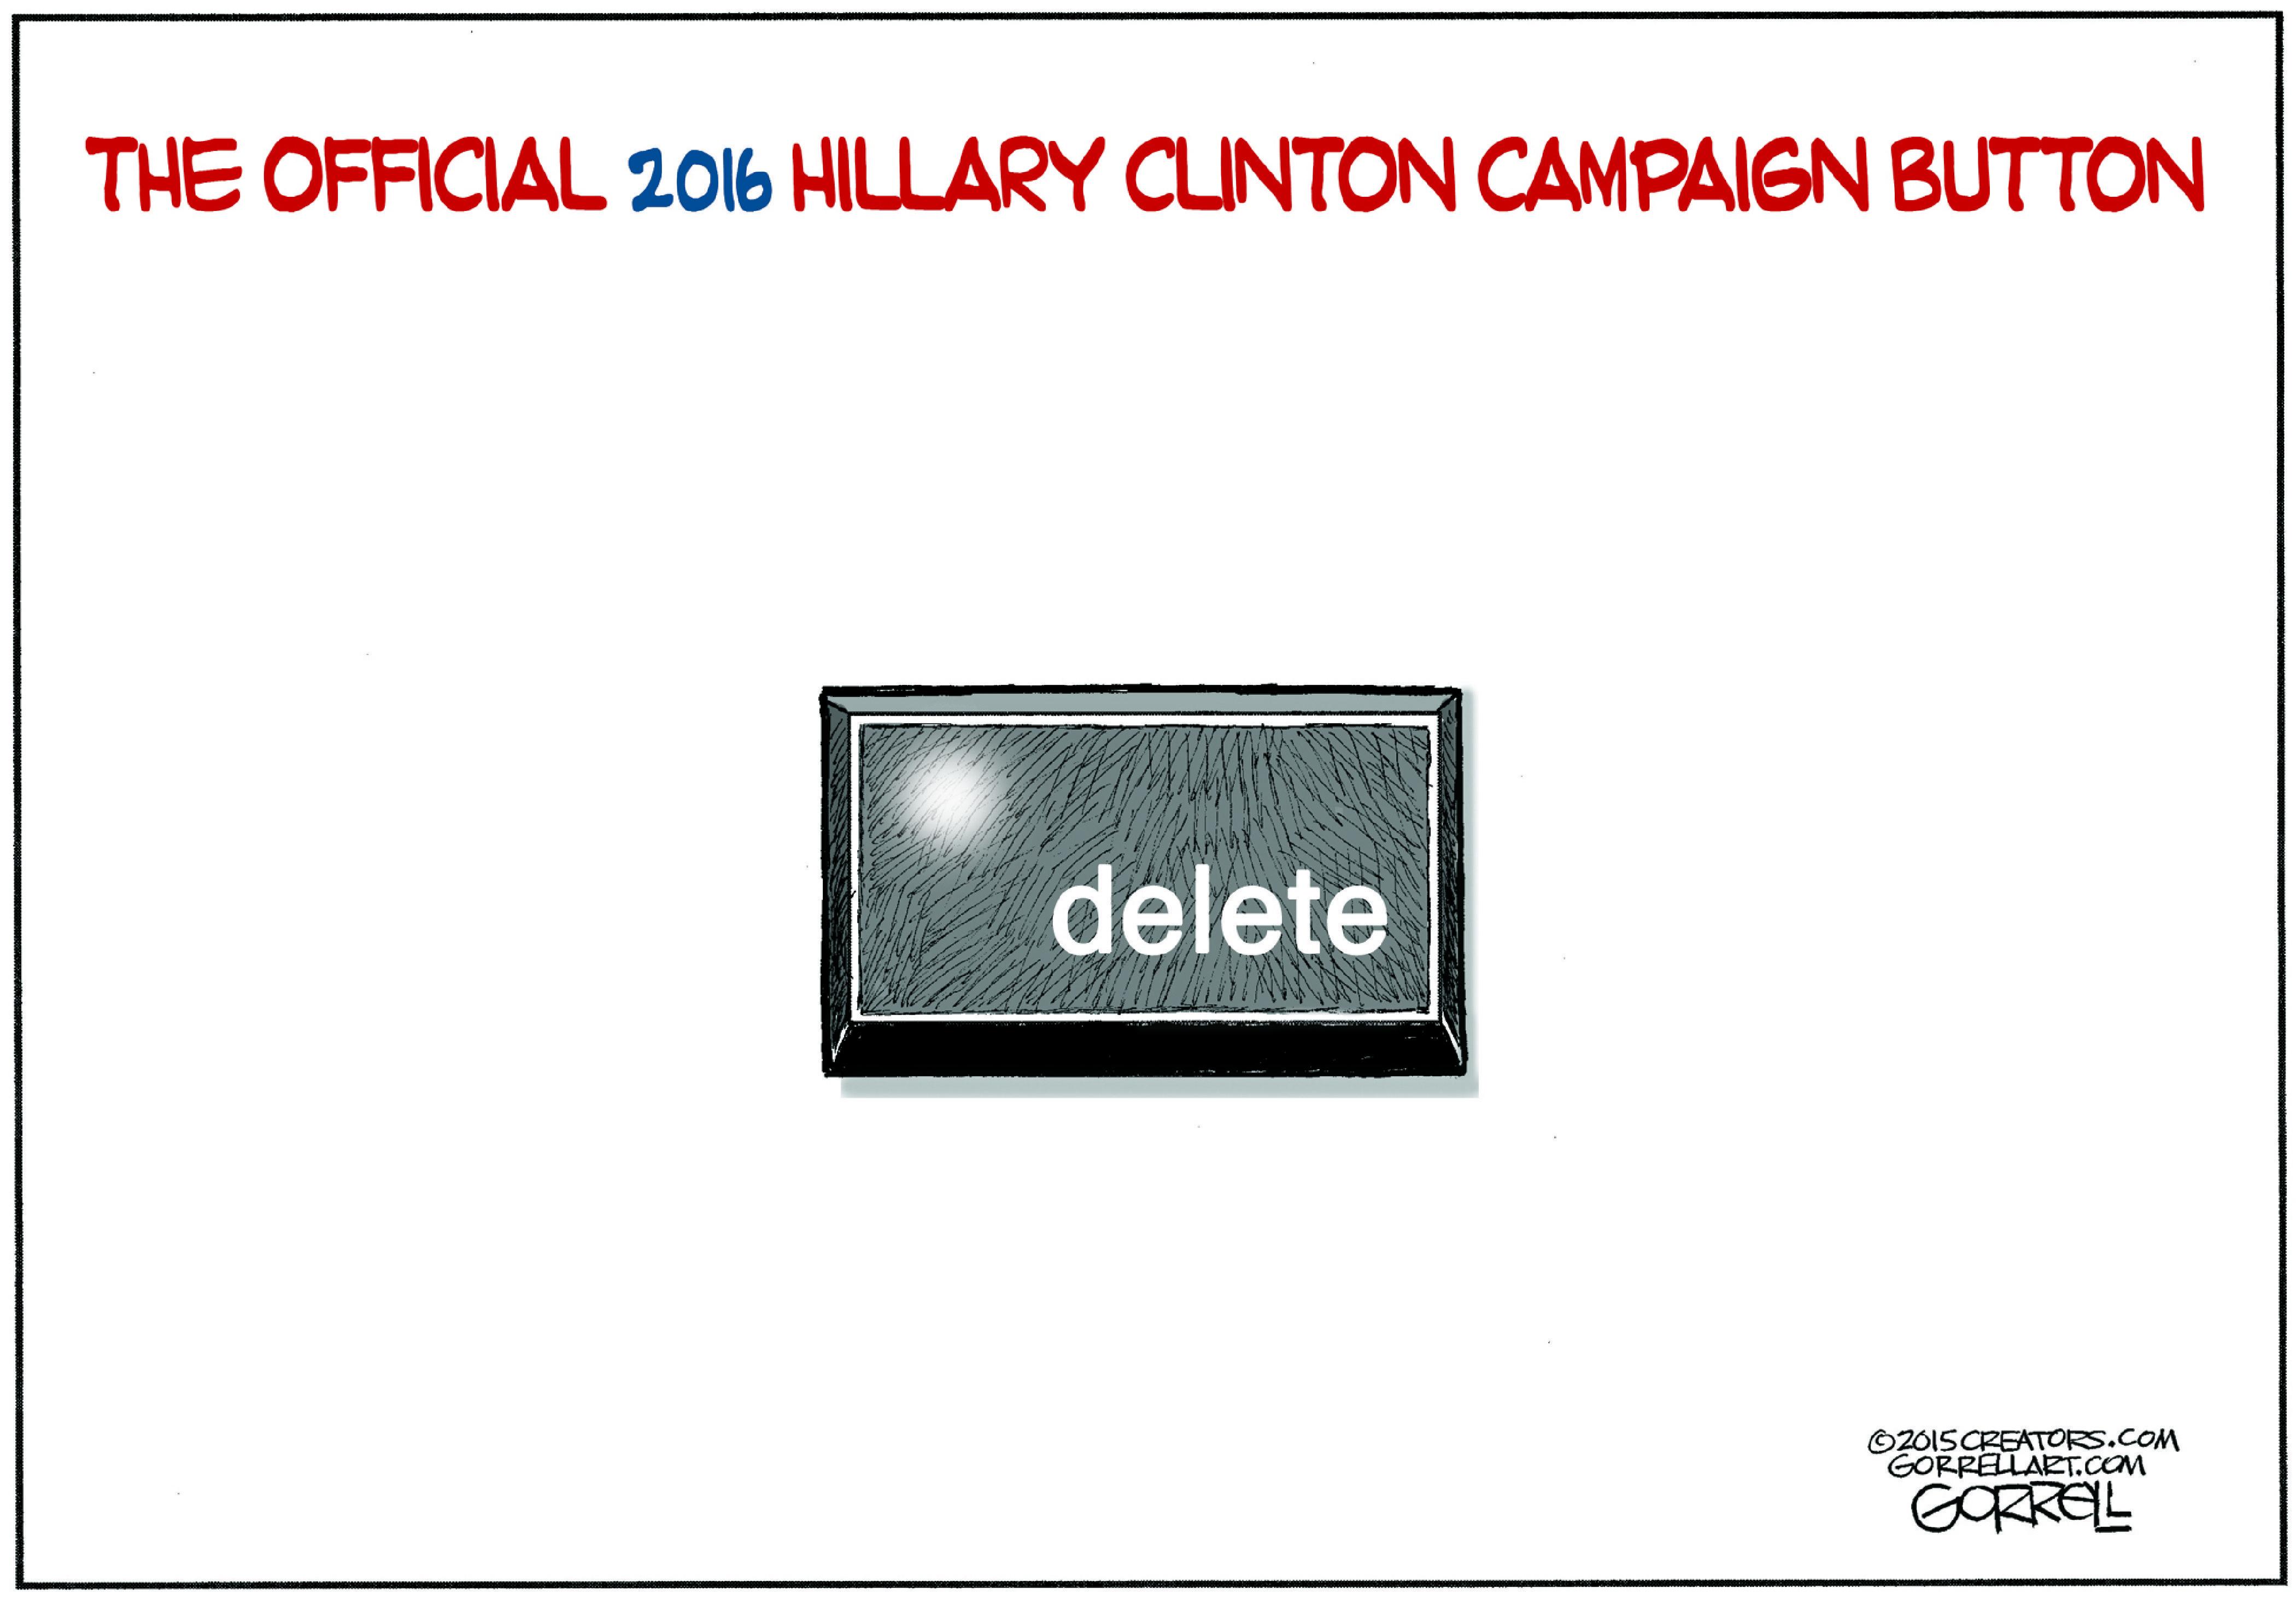 Hillary Clinton's Campaign Button